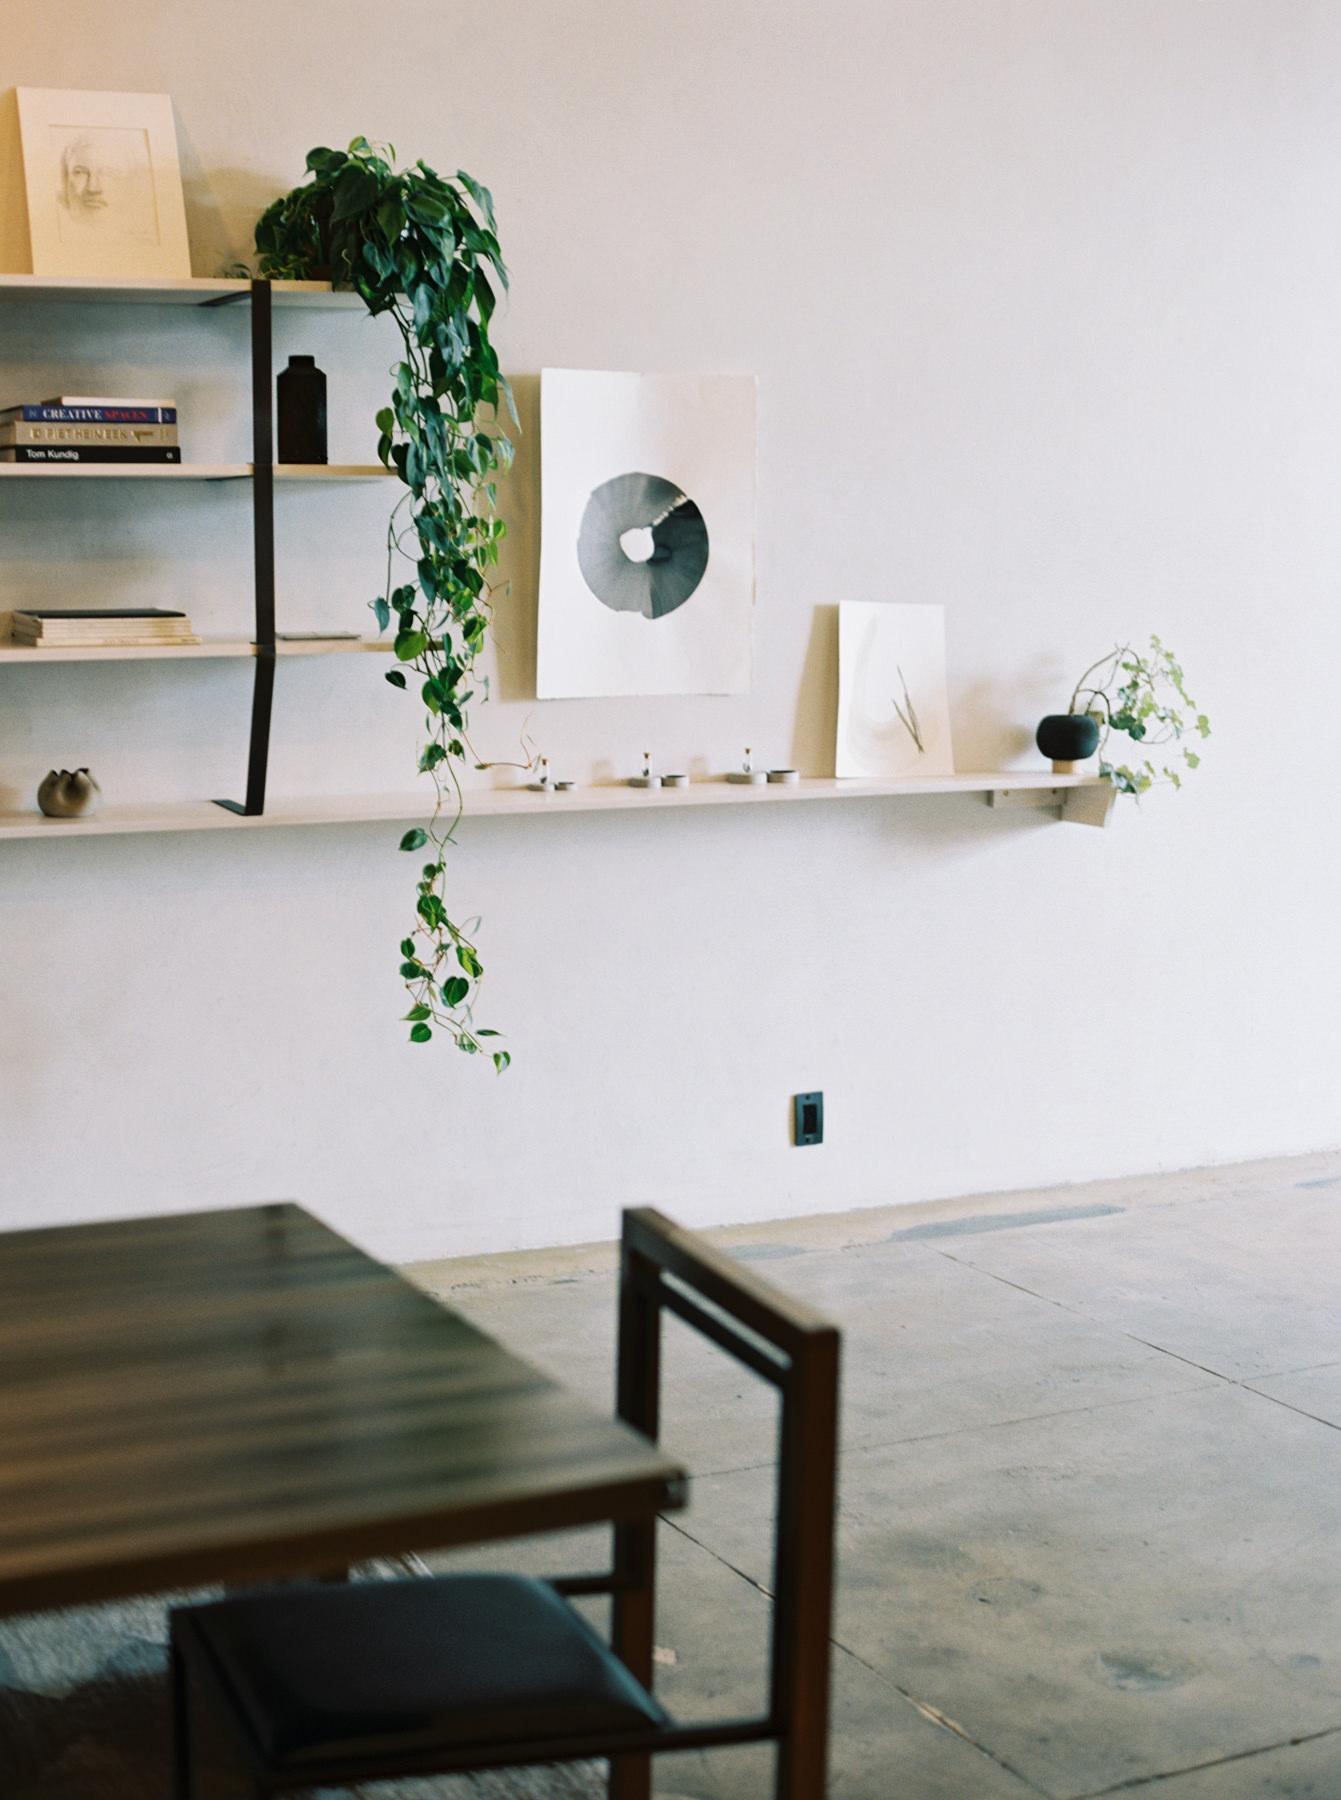 Stephen Kenn, Justin Chung, Loft, Los Angeles, California